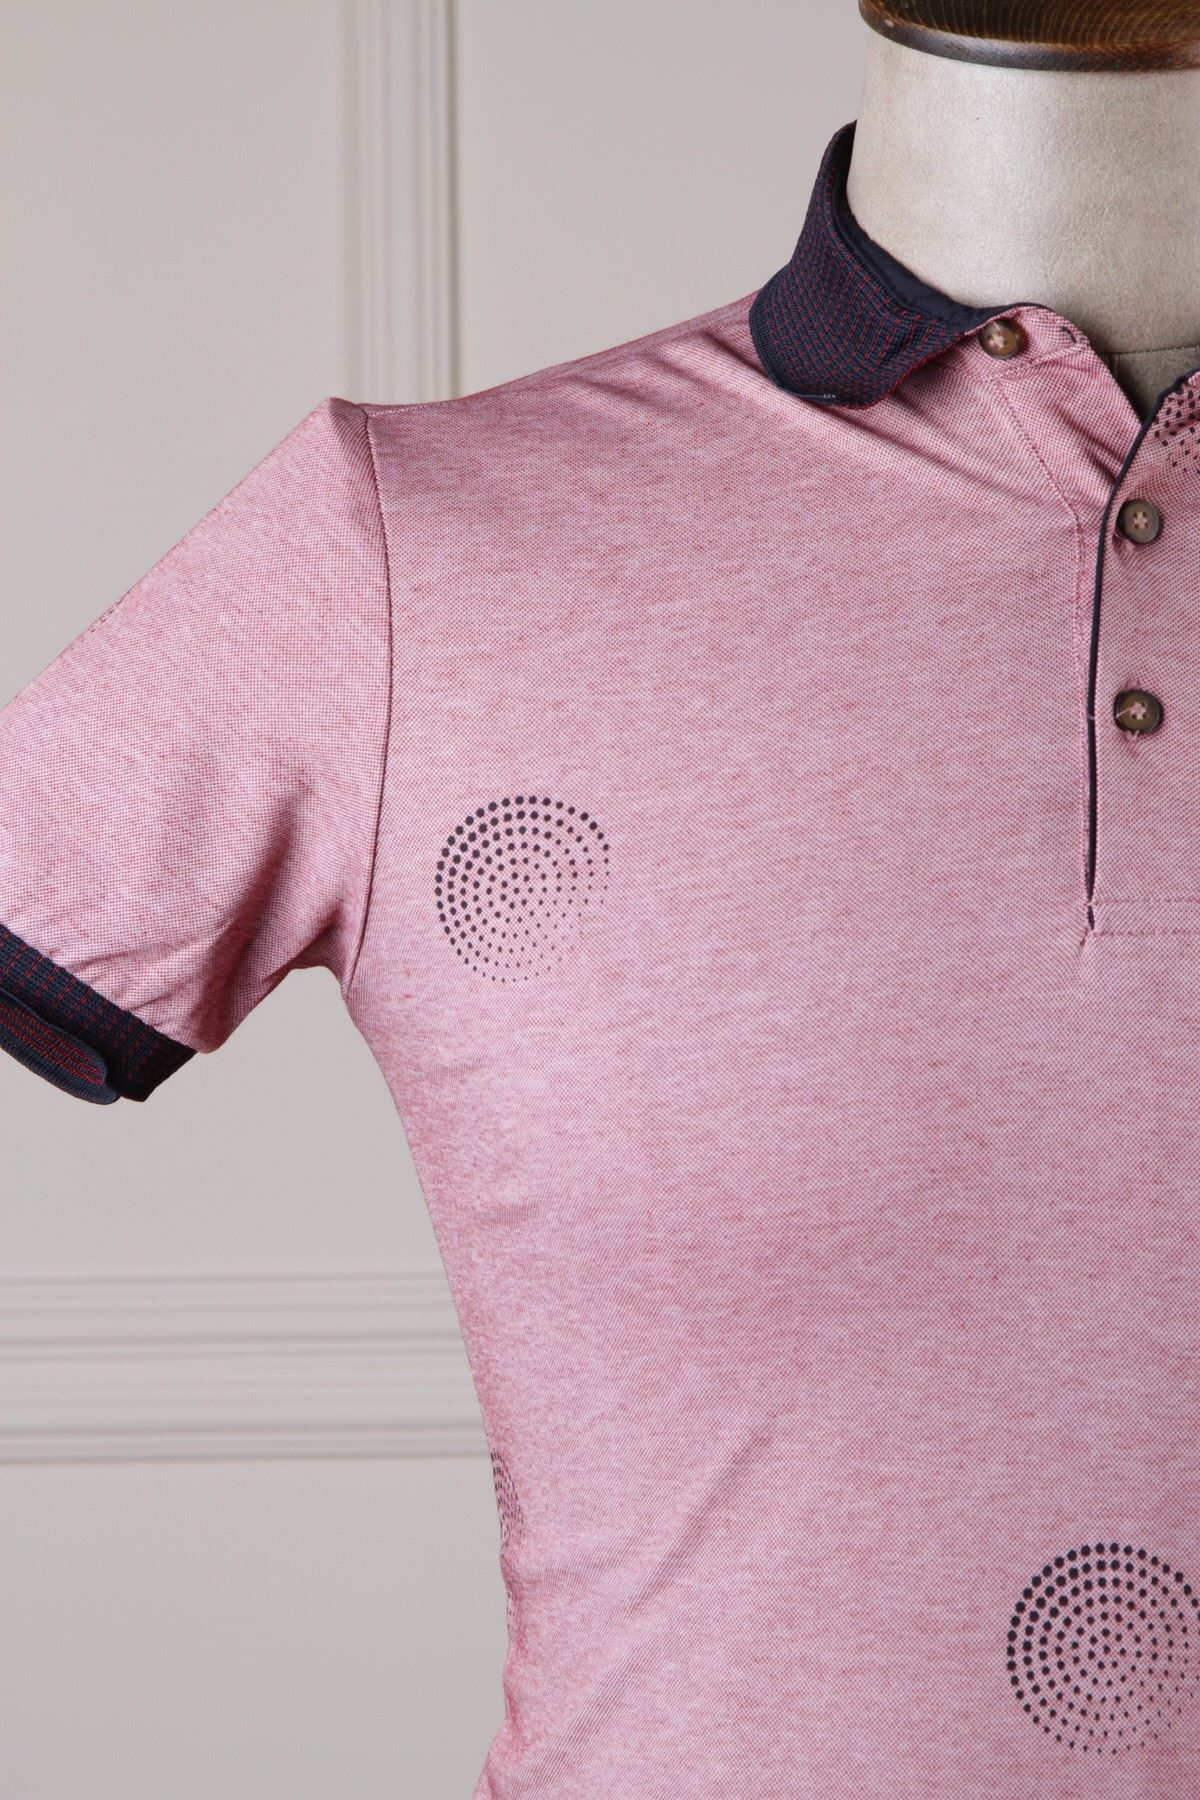 Erkek Desenli Polo Yaka T-Shirt - Gül Kurusu